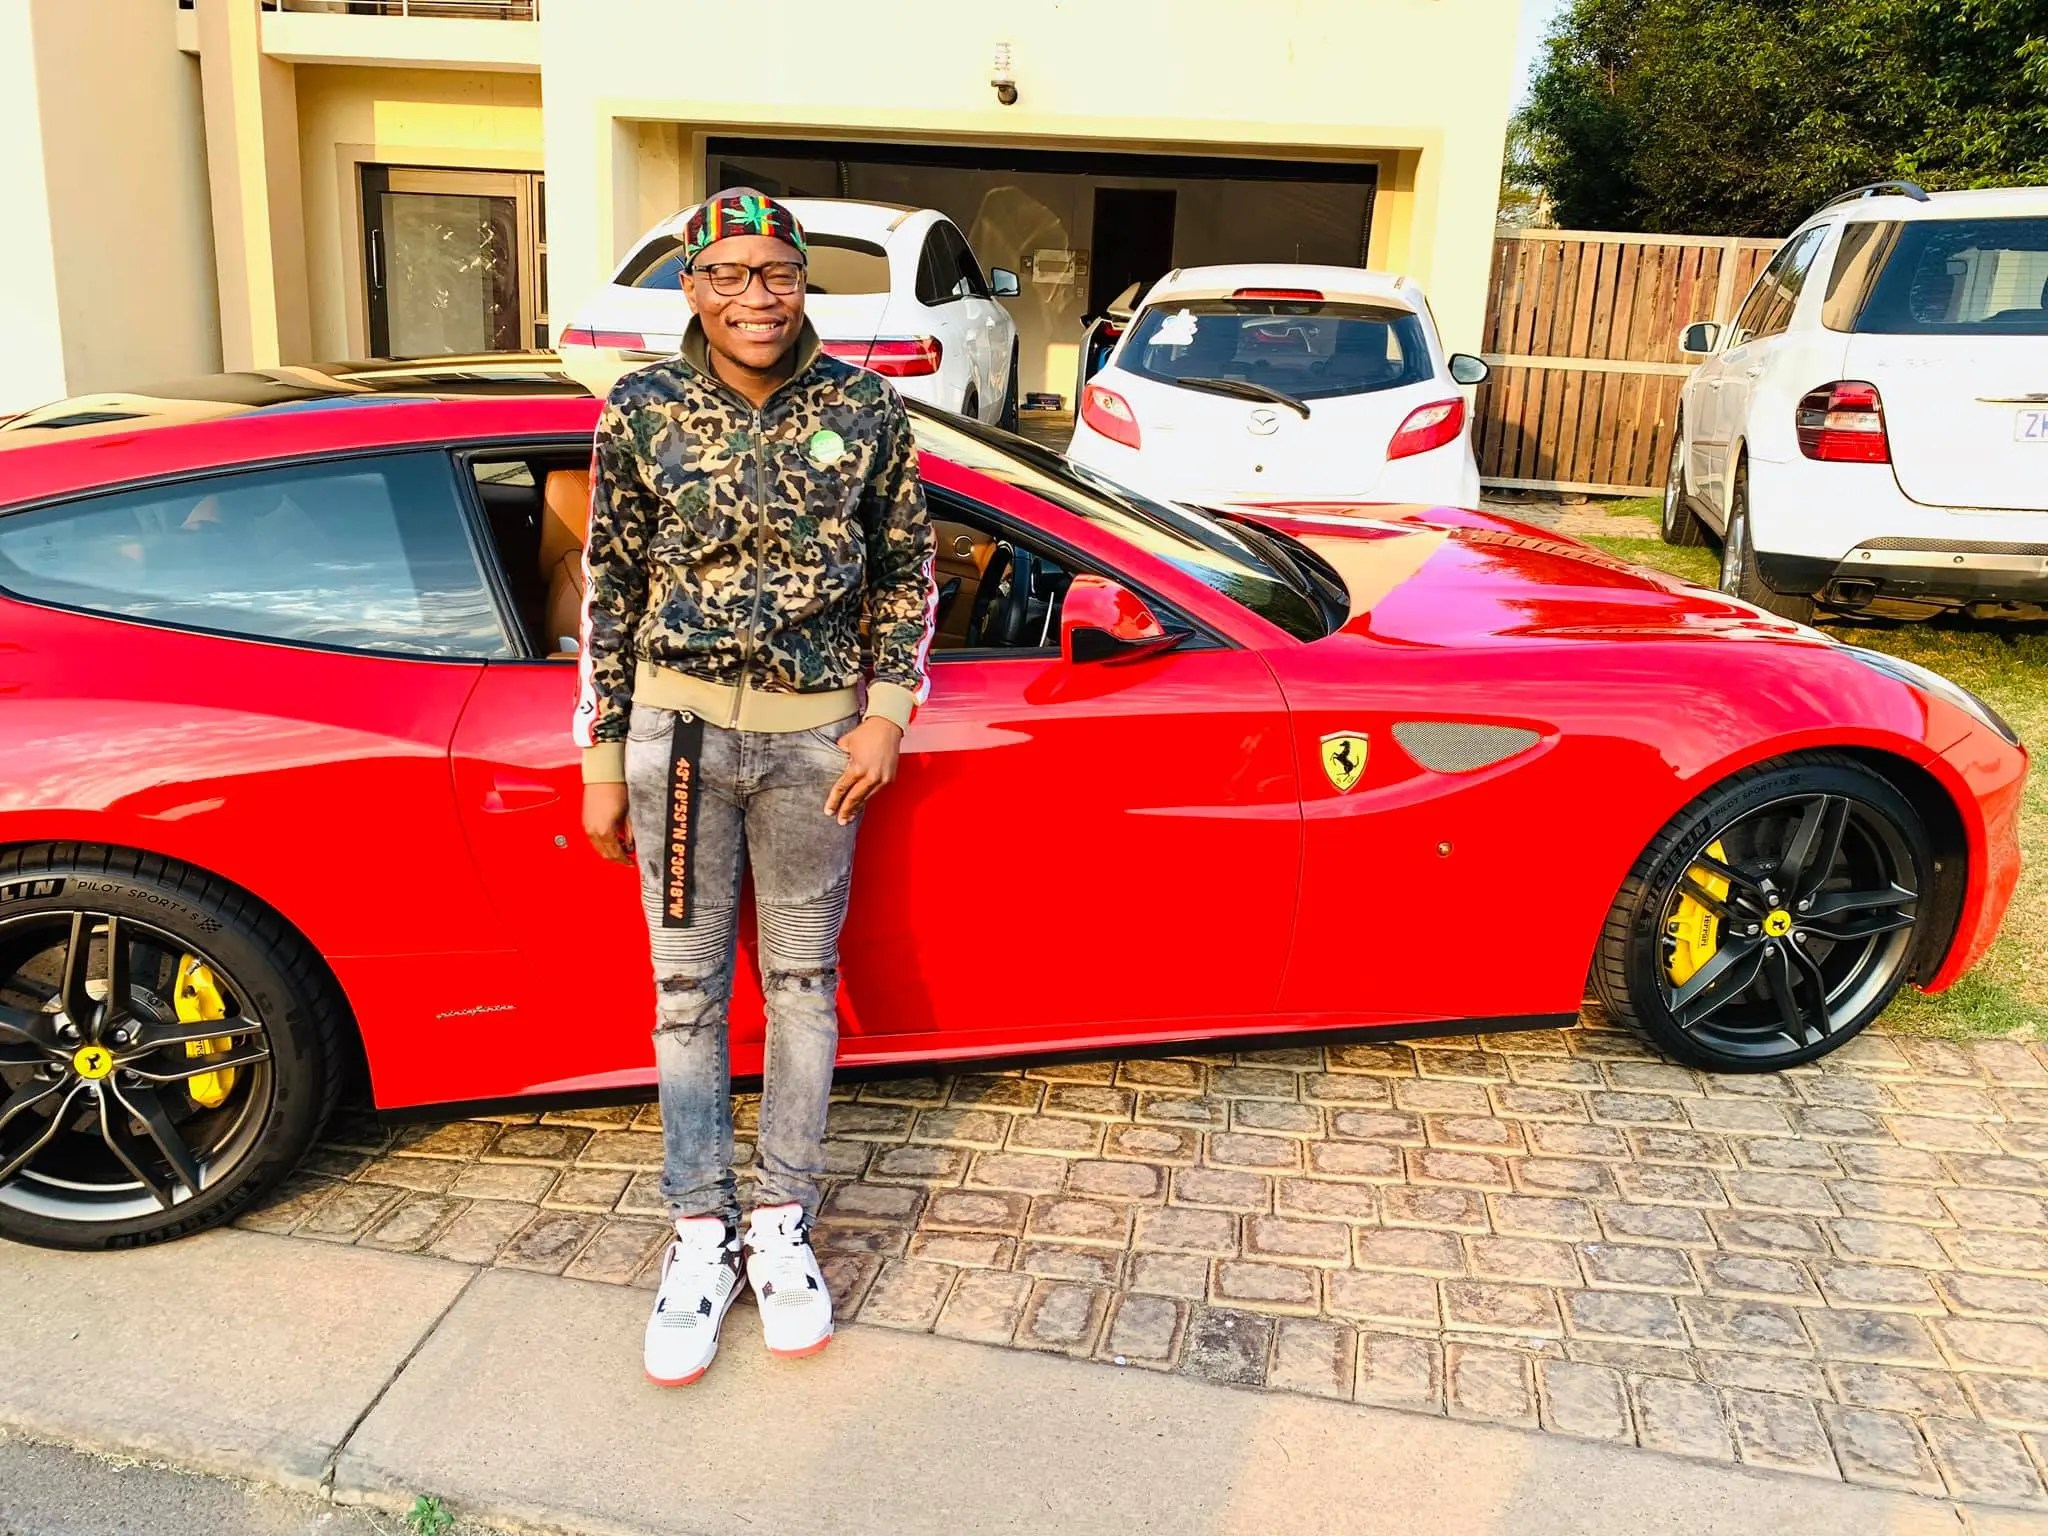 master kg buys new Ferrari car